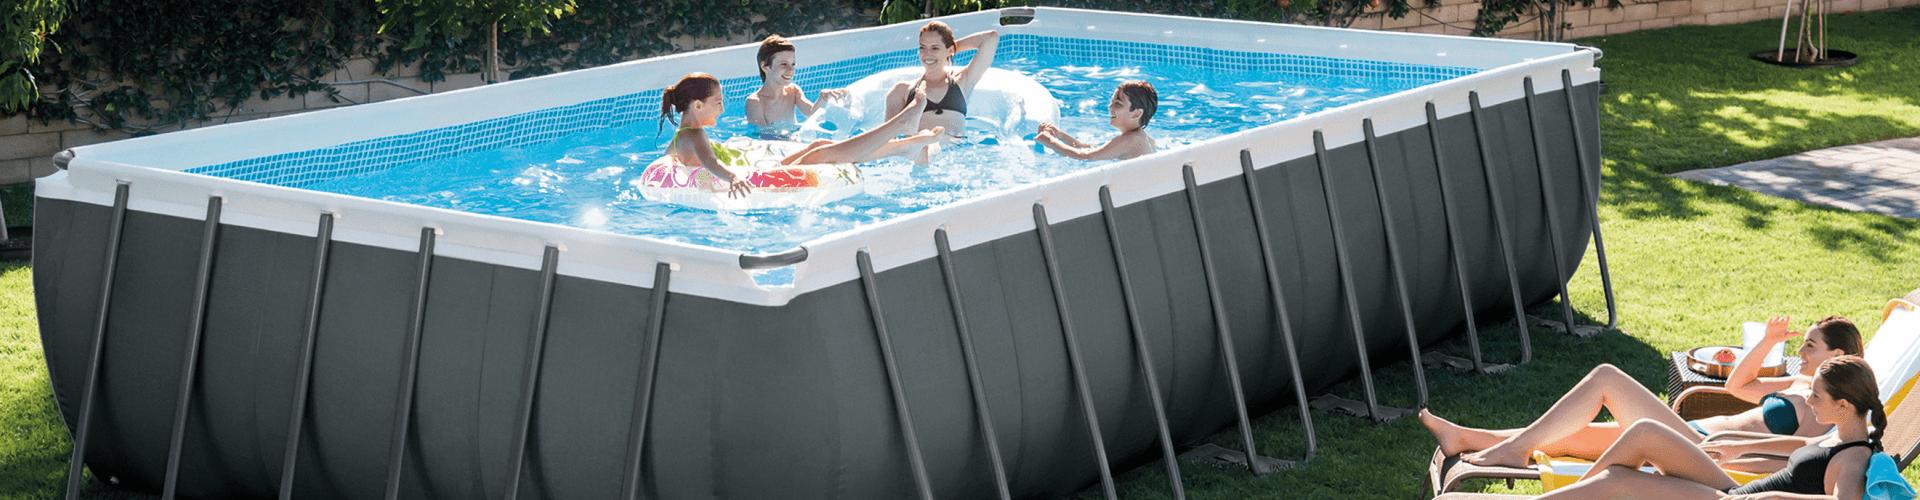 Intex bazeni i oprema